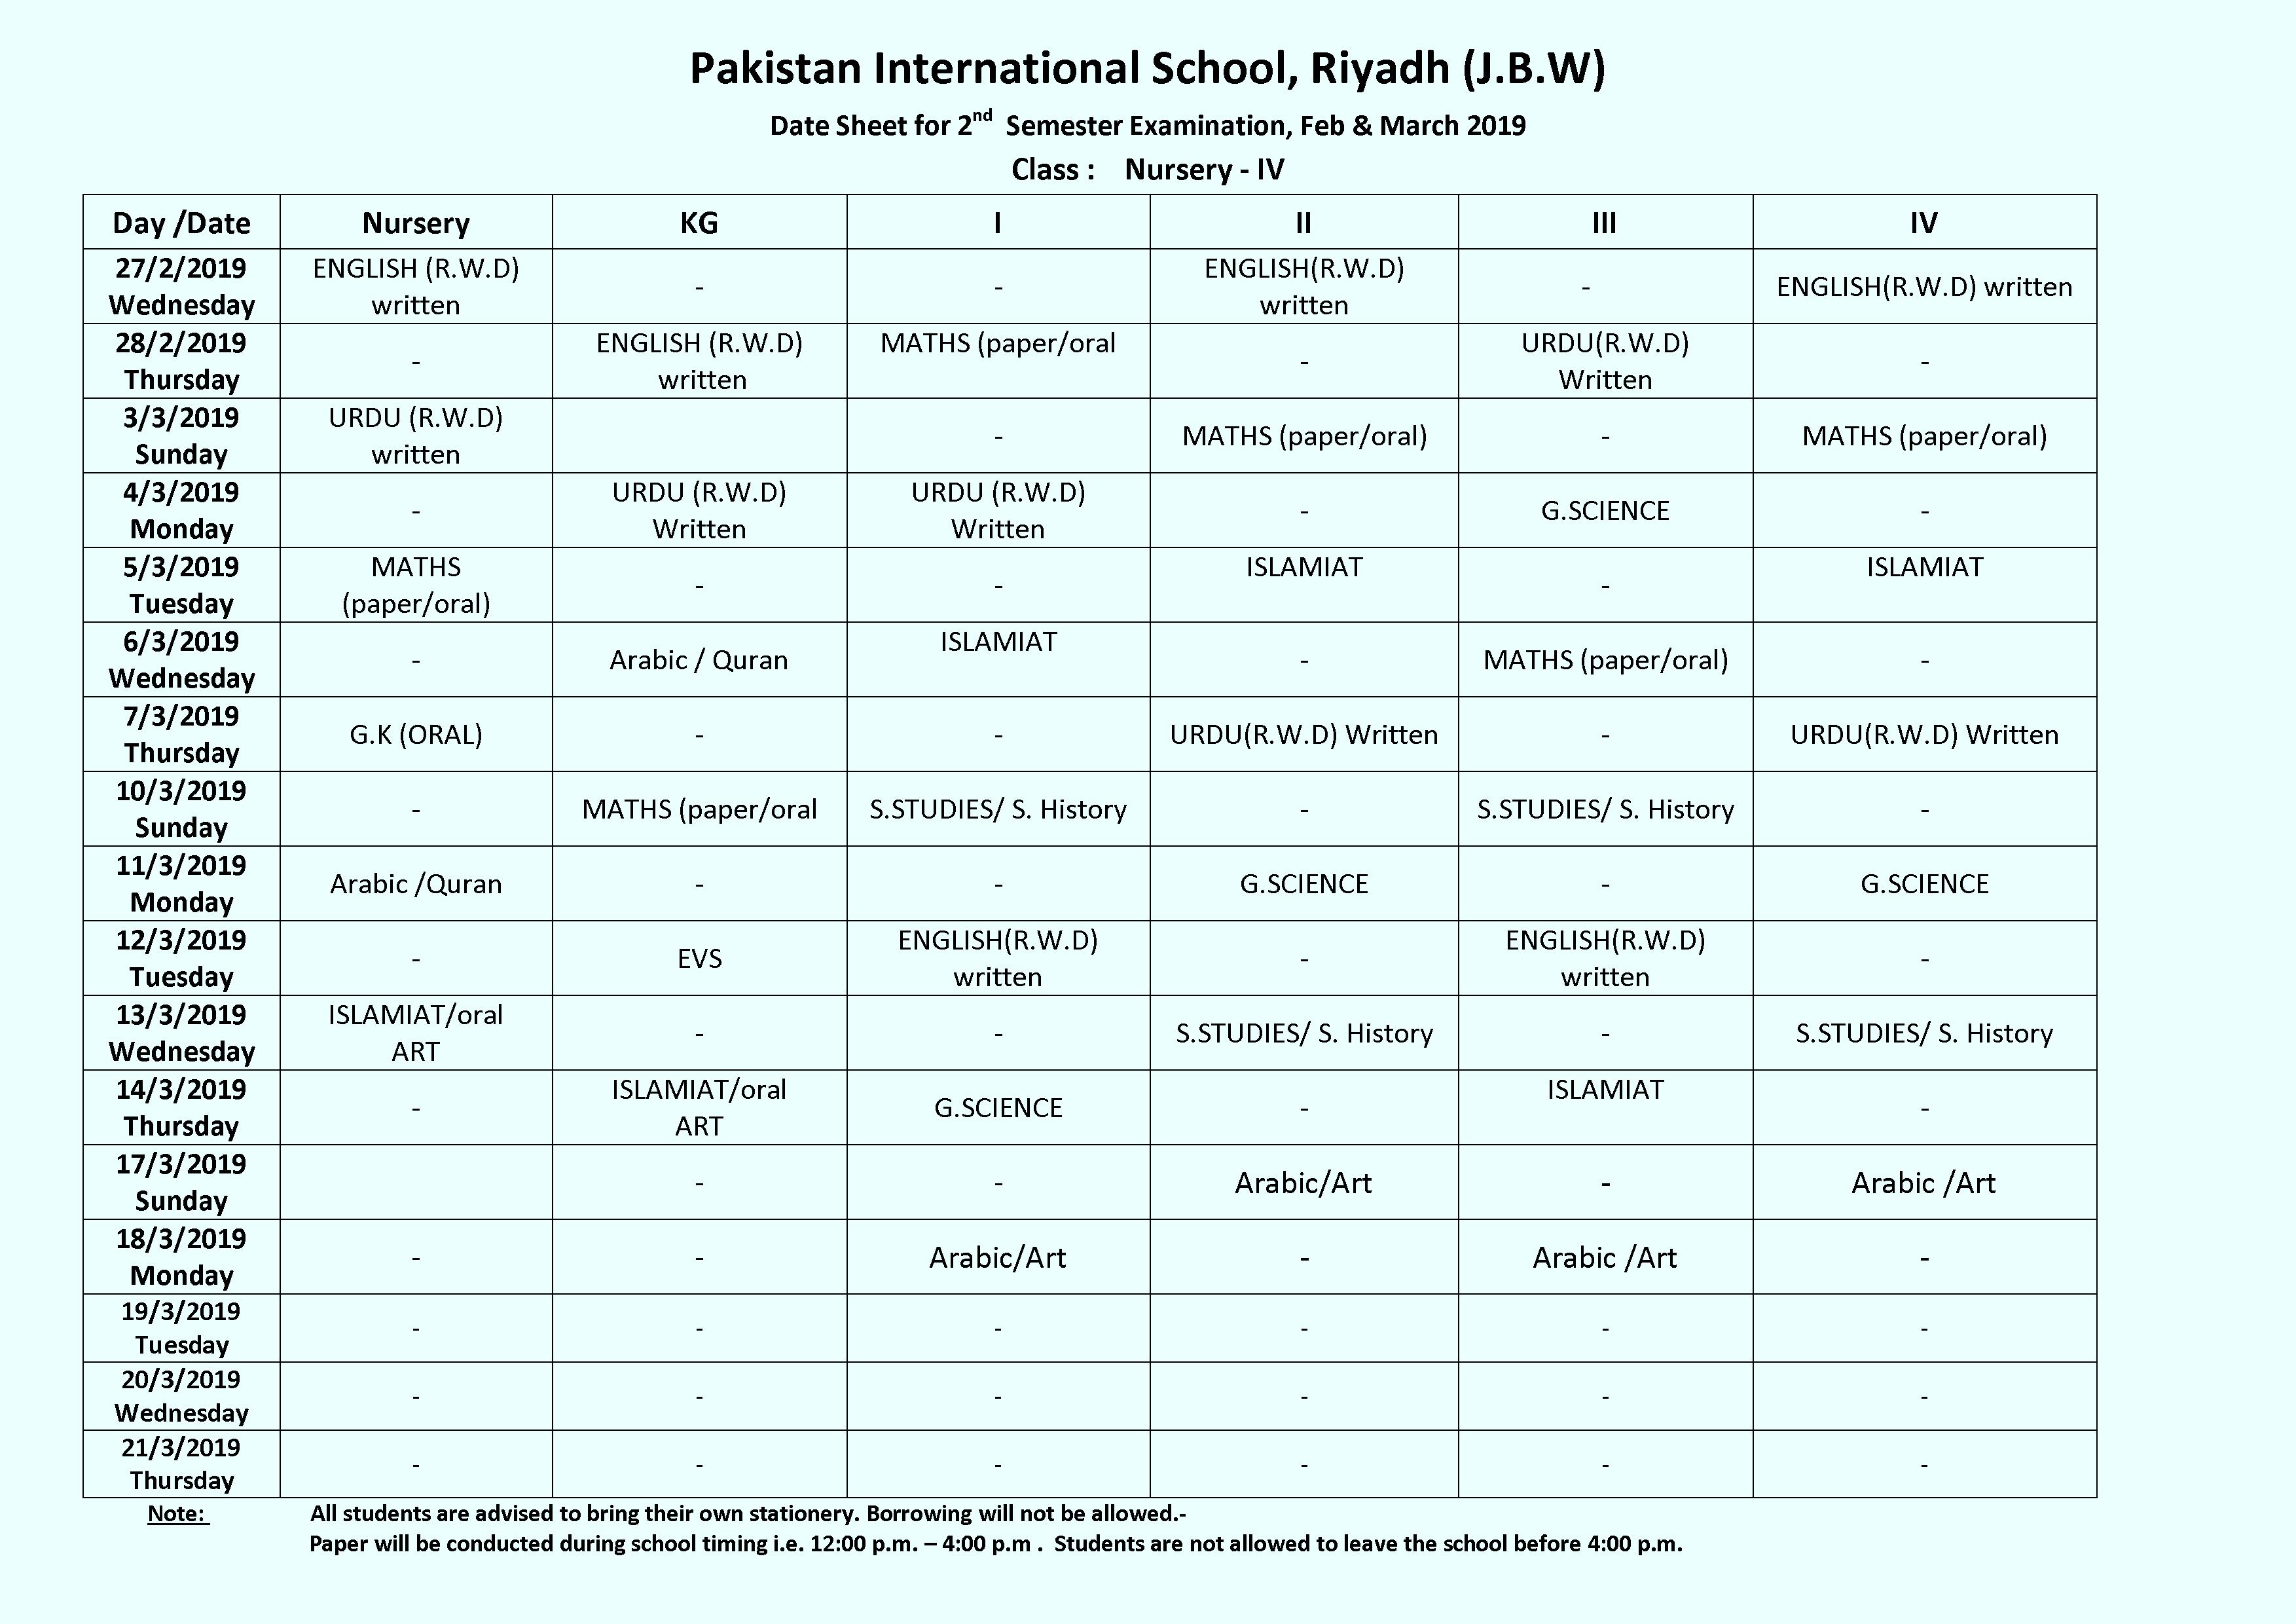 Date Sheet for 2nd Semester Examination 2018-19 — Pakistan